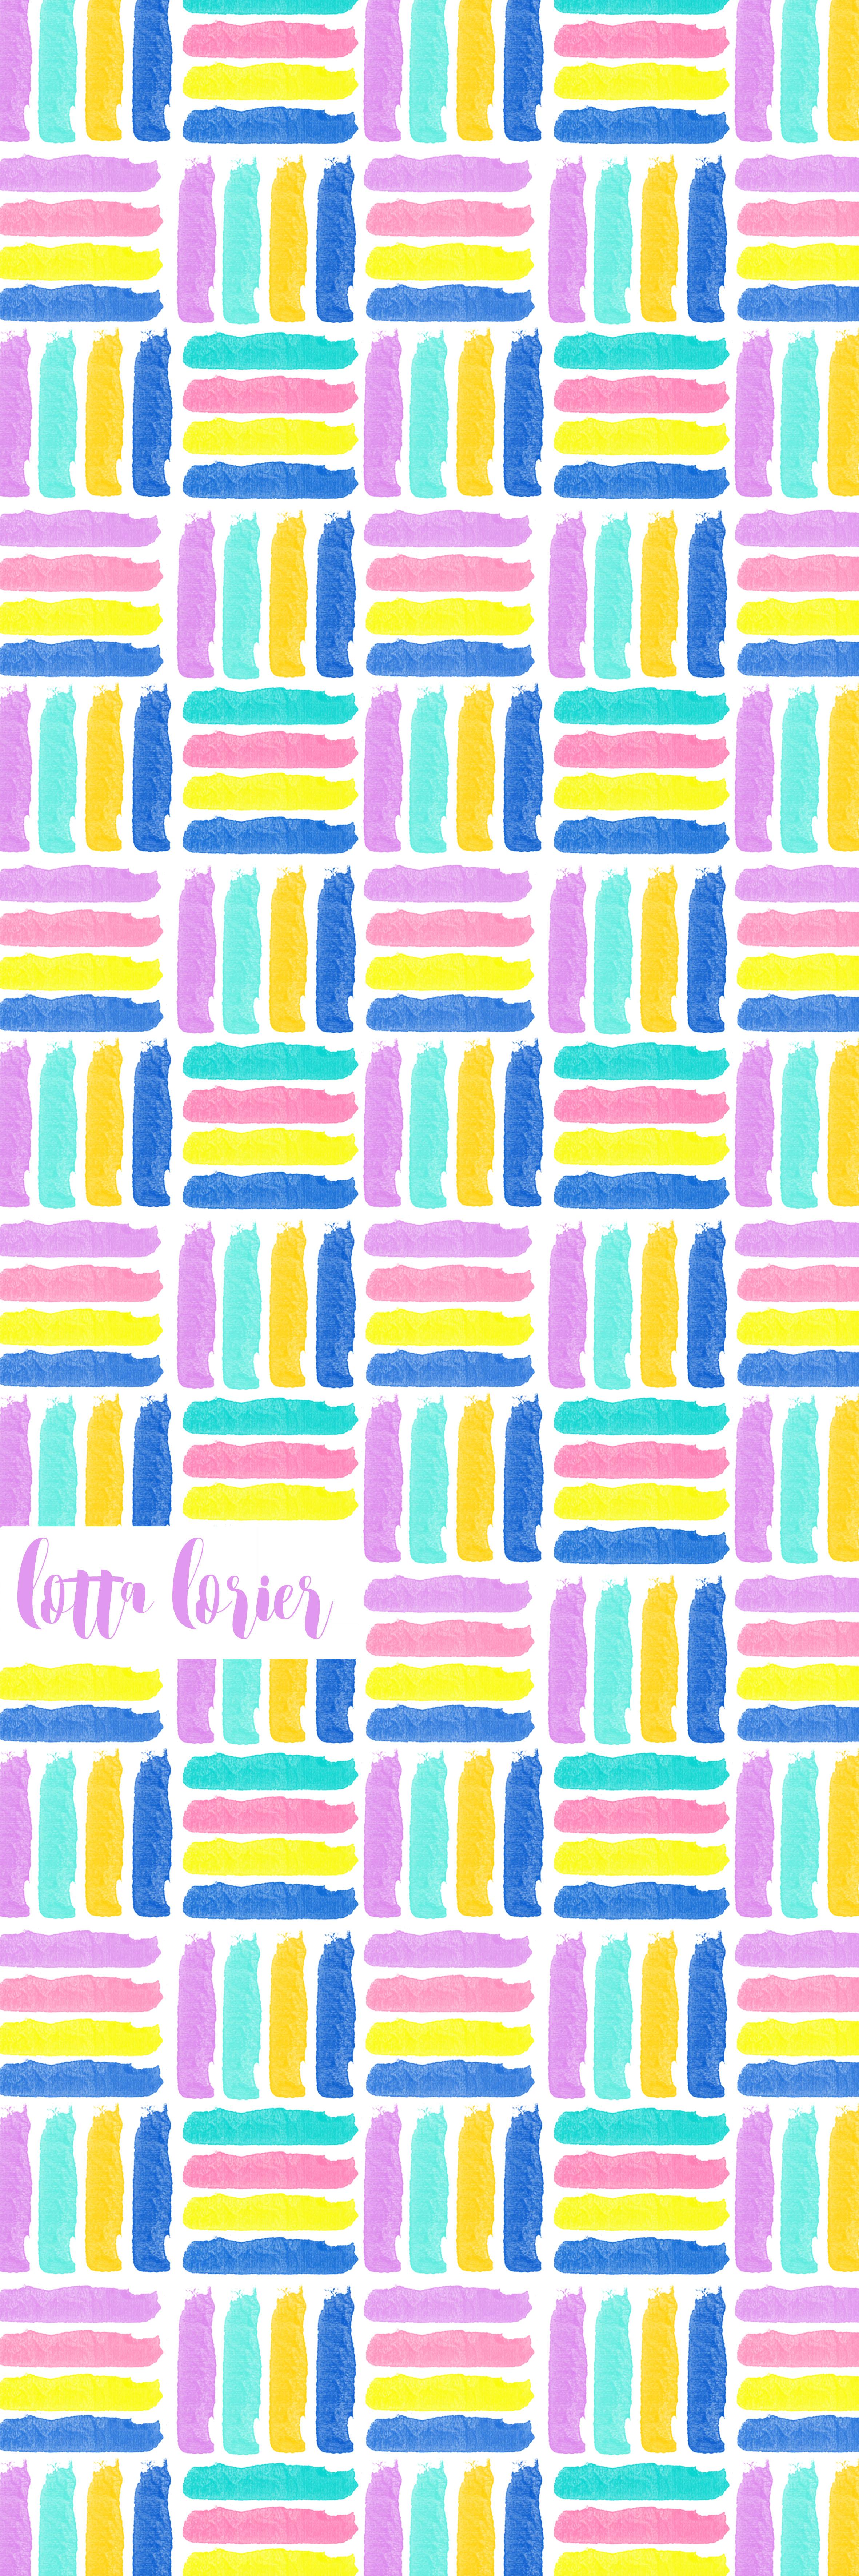 90s throwback neon pastel Lotta Lorier Prints Patterns 1 2362x7087